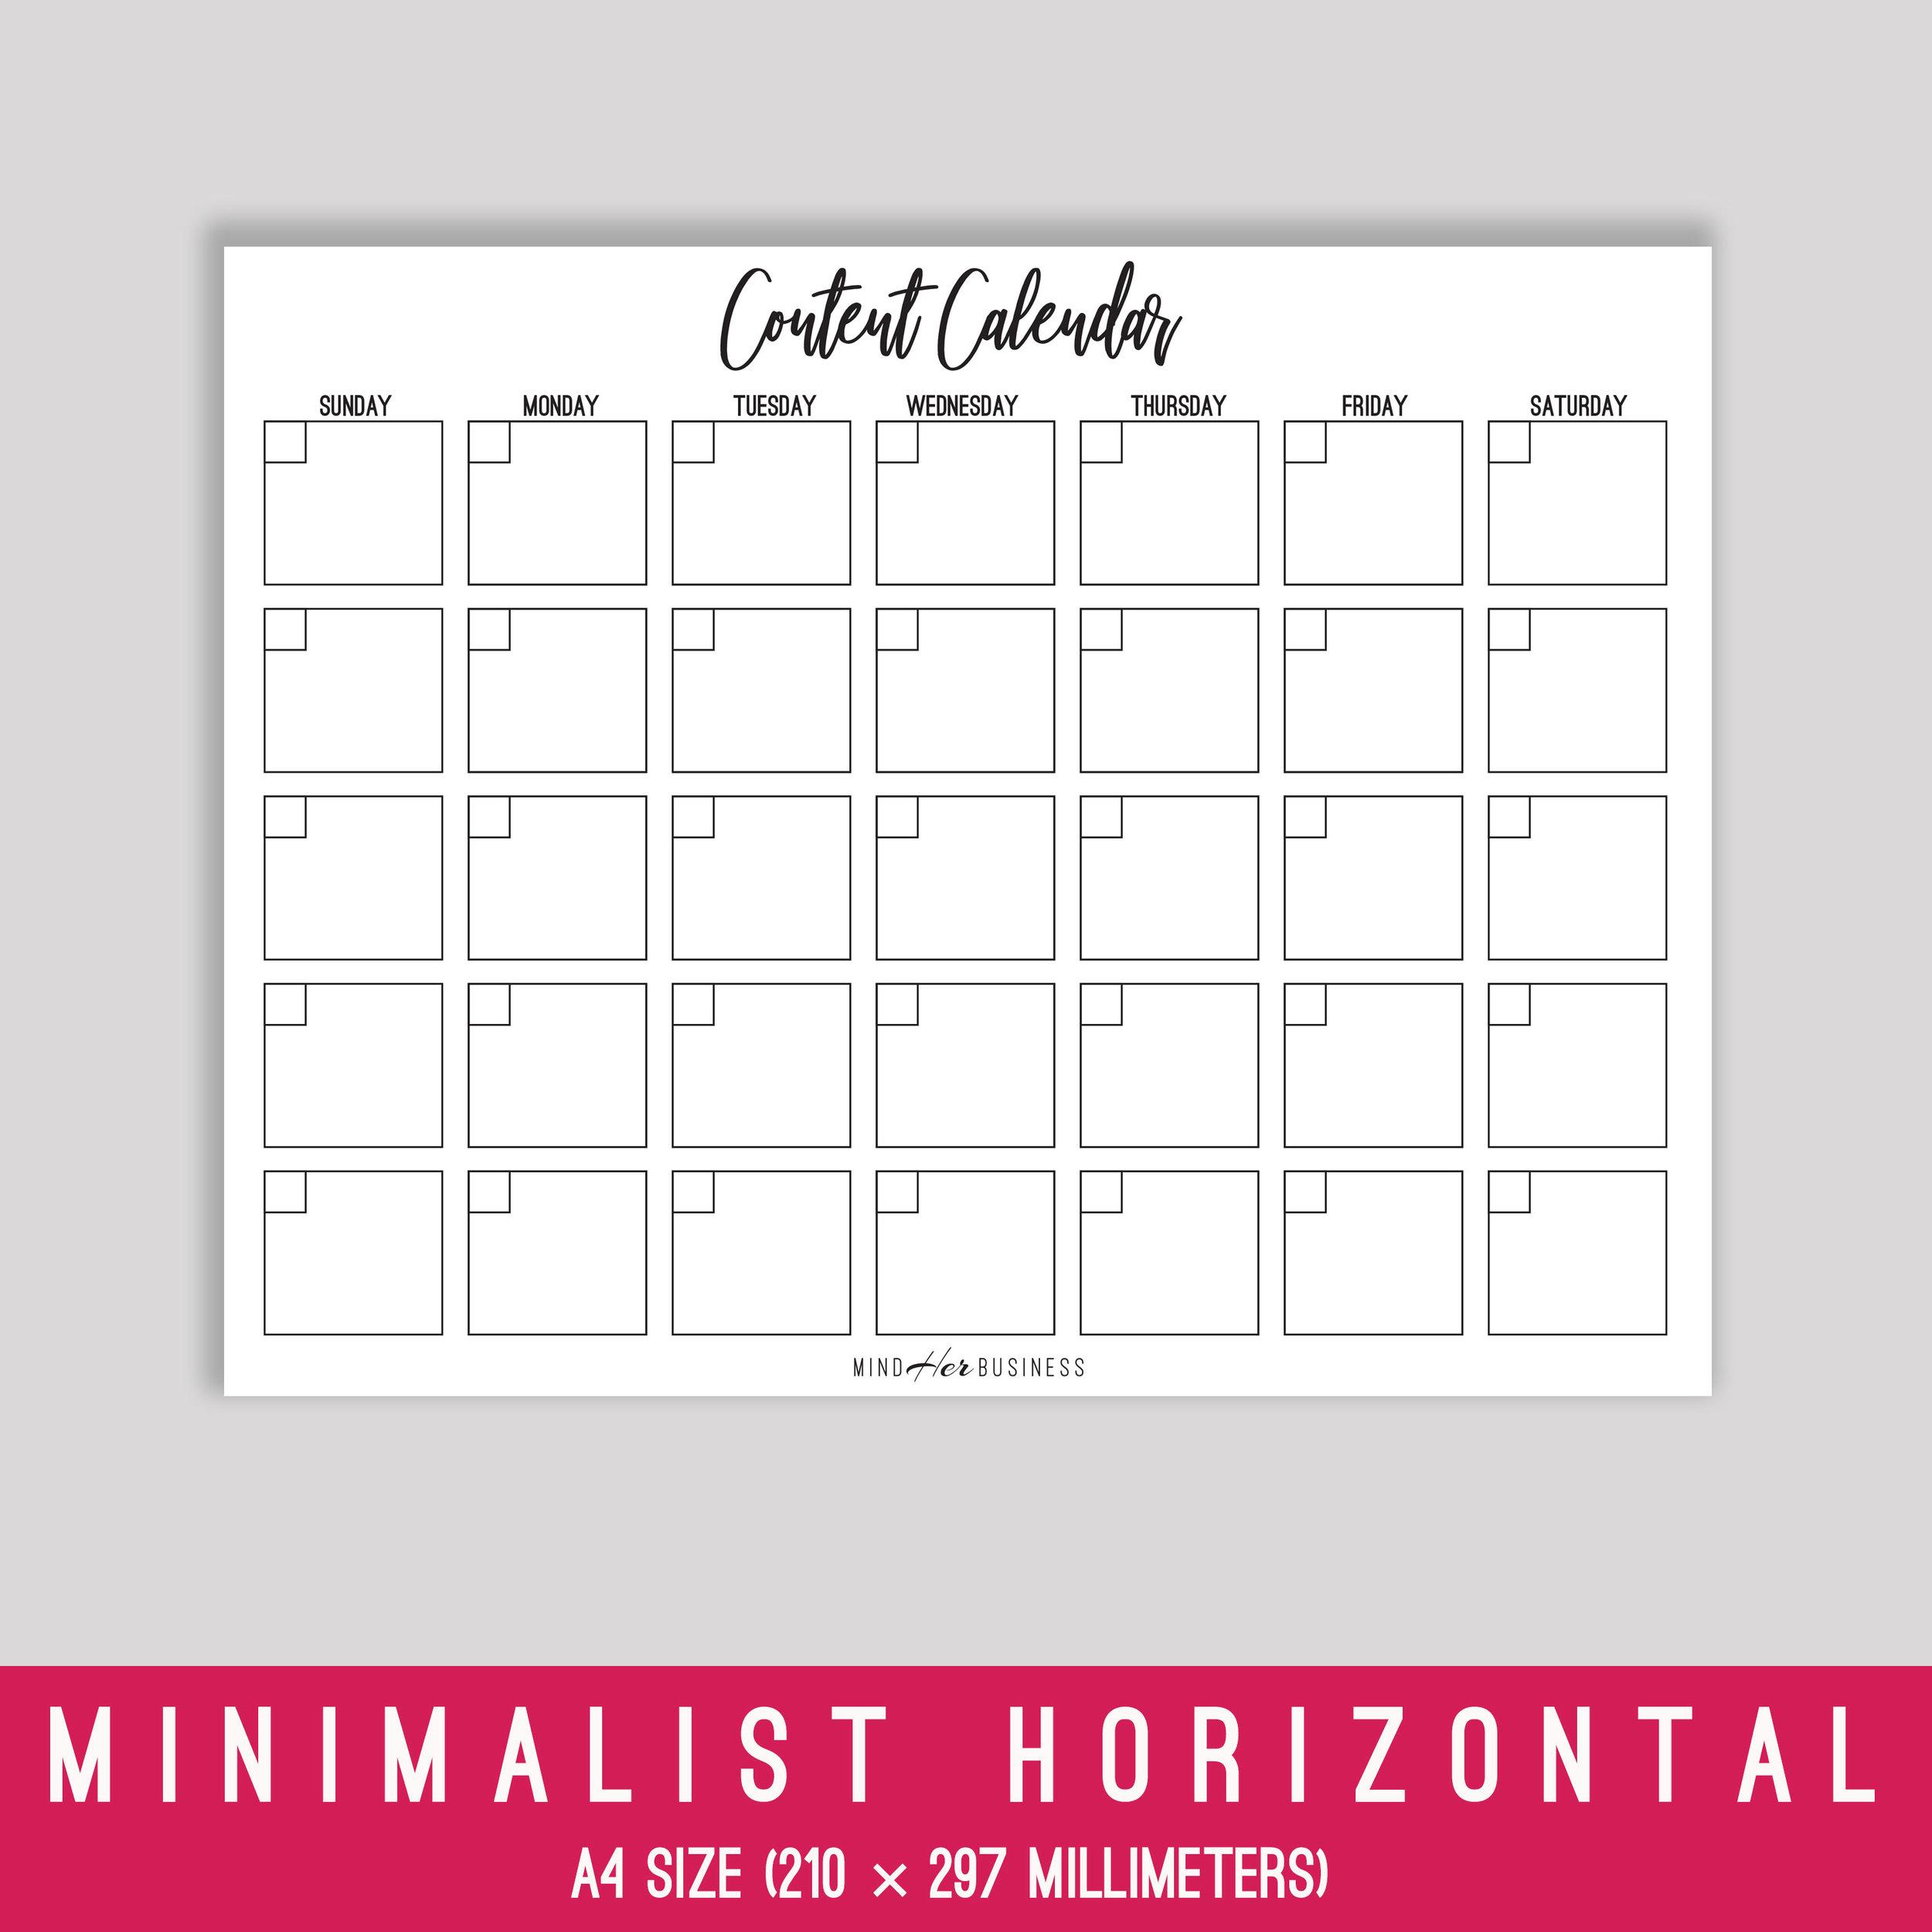 mhb-calendar-mockup-minimalist-horizontal-a4.jpg